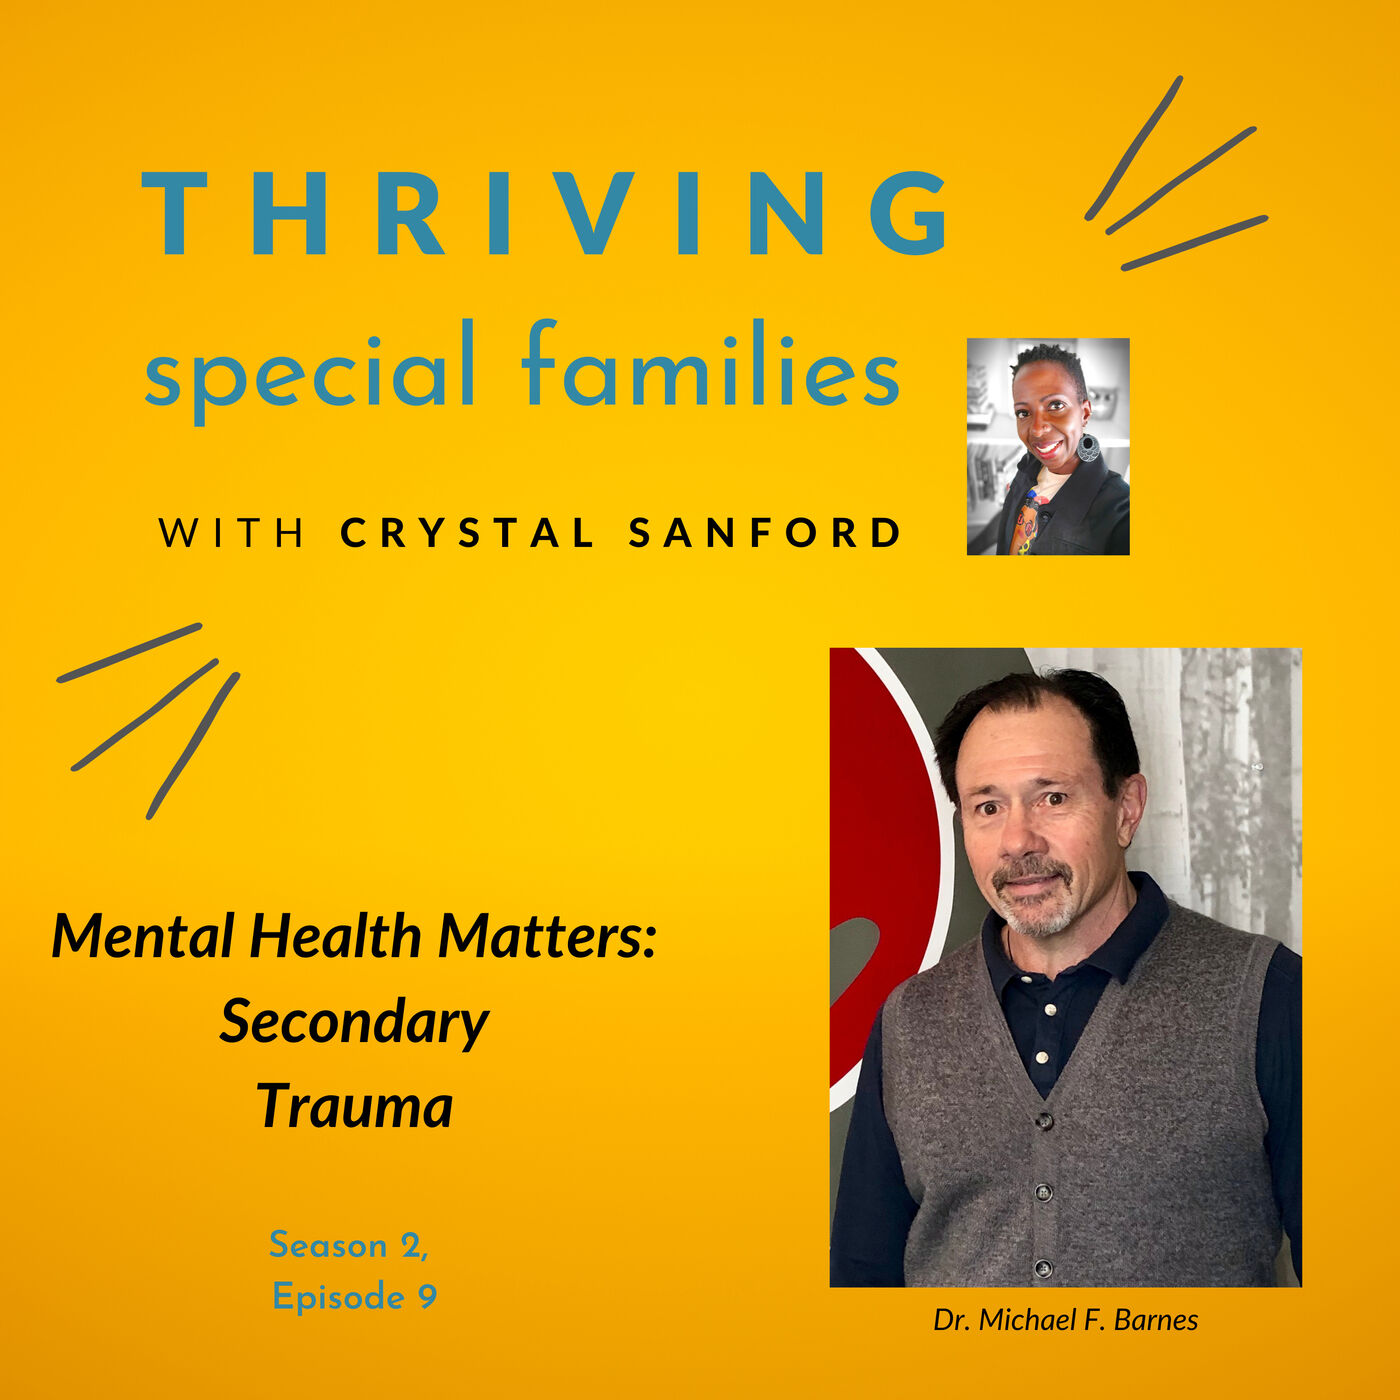 Mental Health Matters: Secondary Trauma